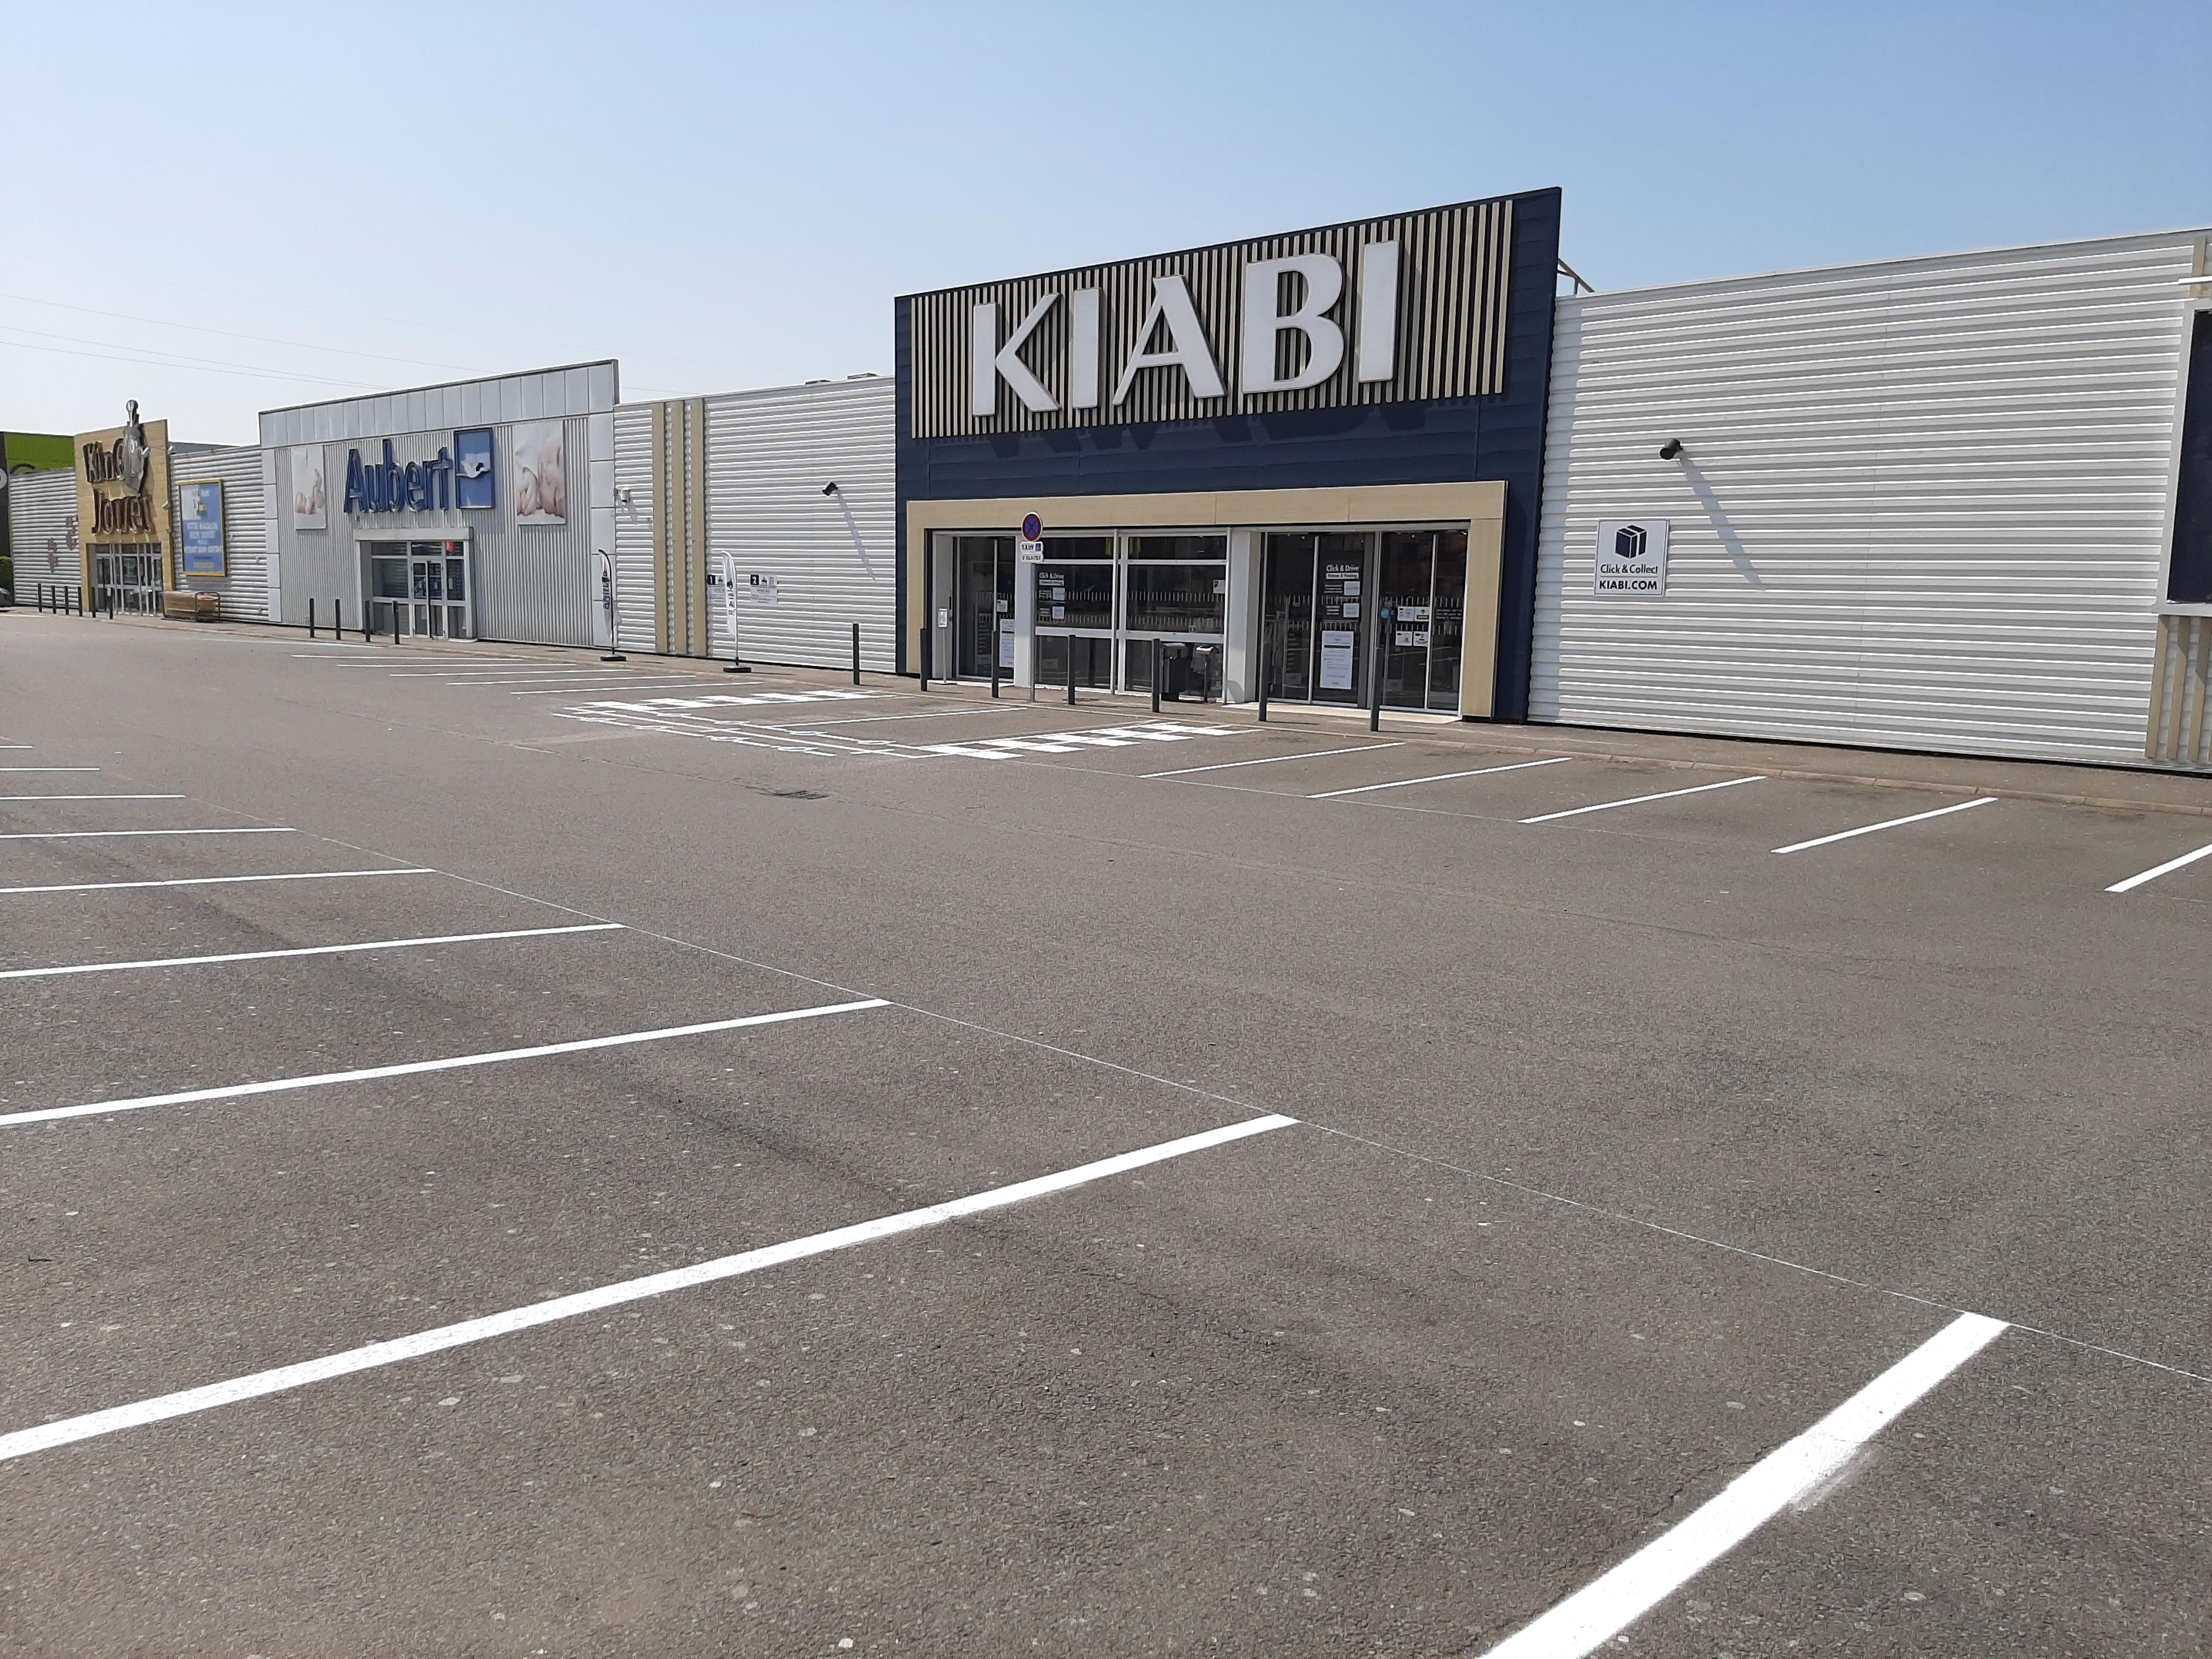 Kiabi Villefranche Sur Saône